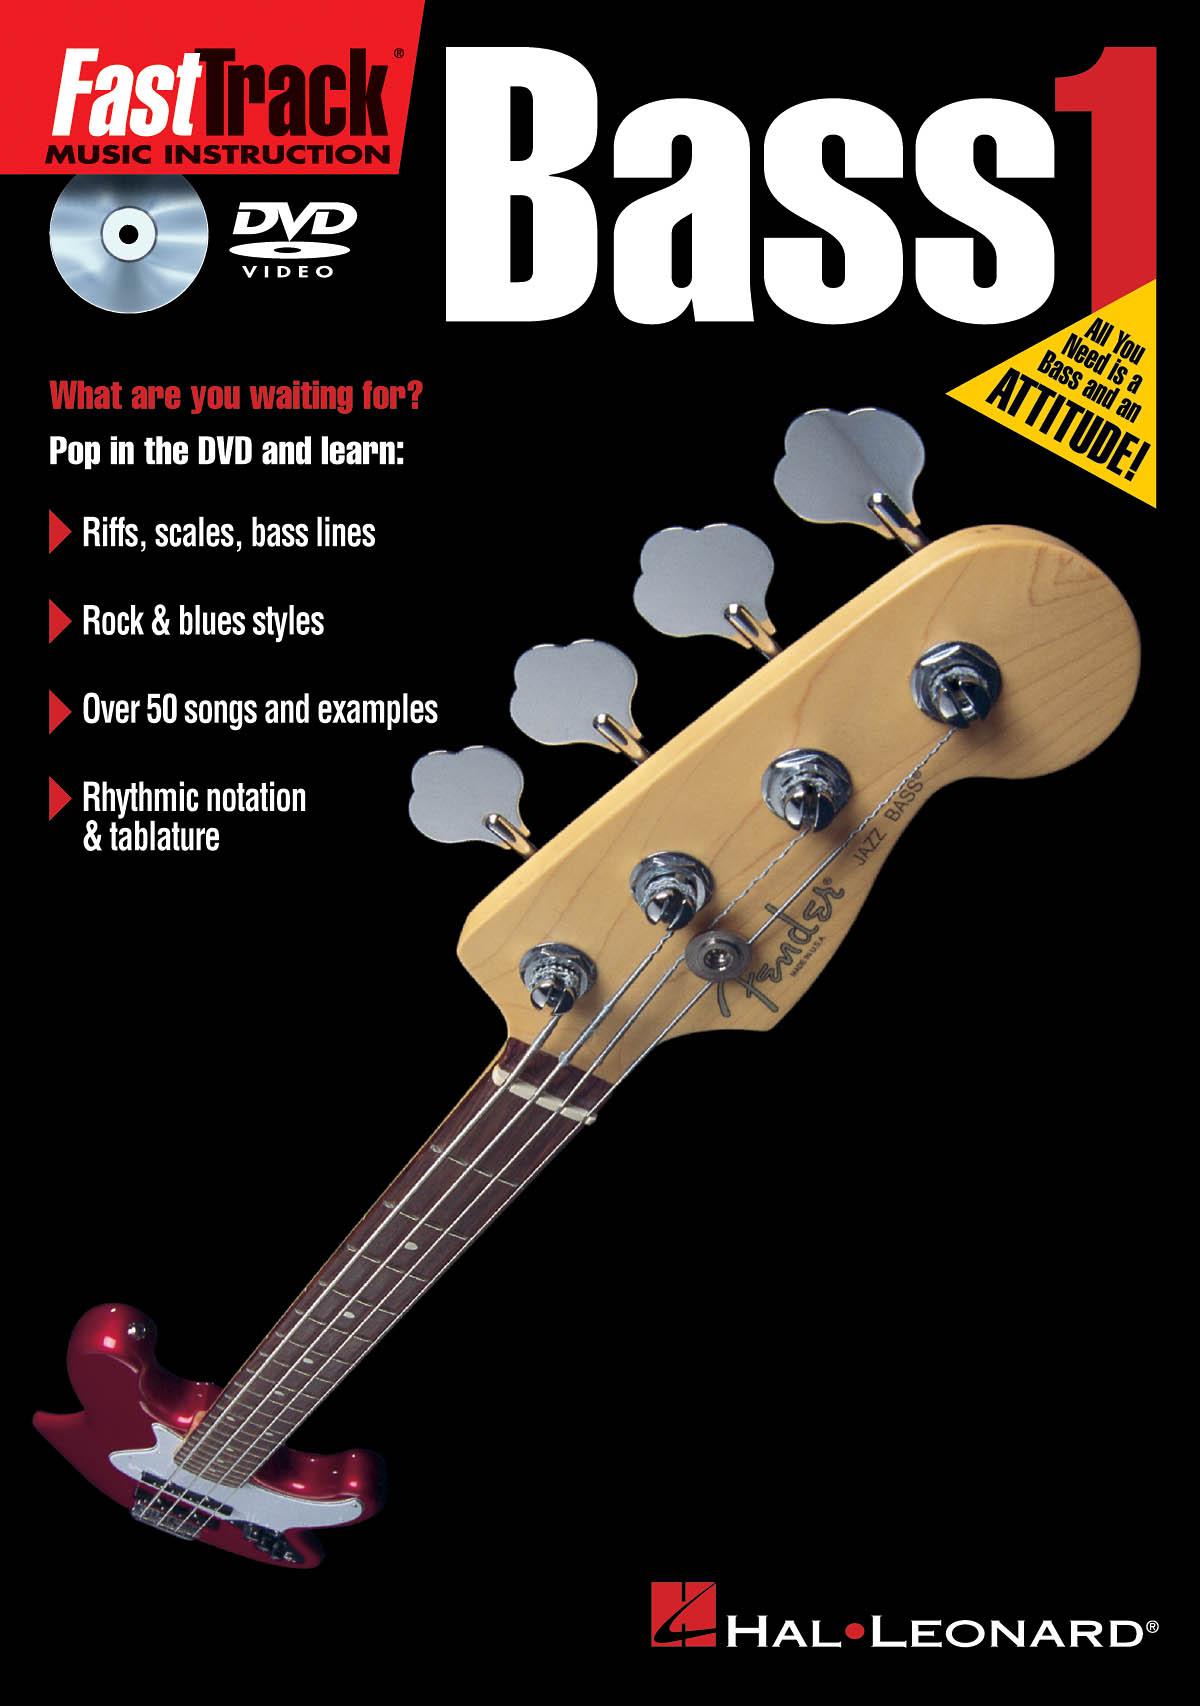 Eric W. Wills: FastTrack - Bass Method 1 - DVD: Bass Guitar Solo: Instrumental